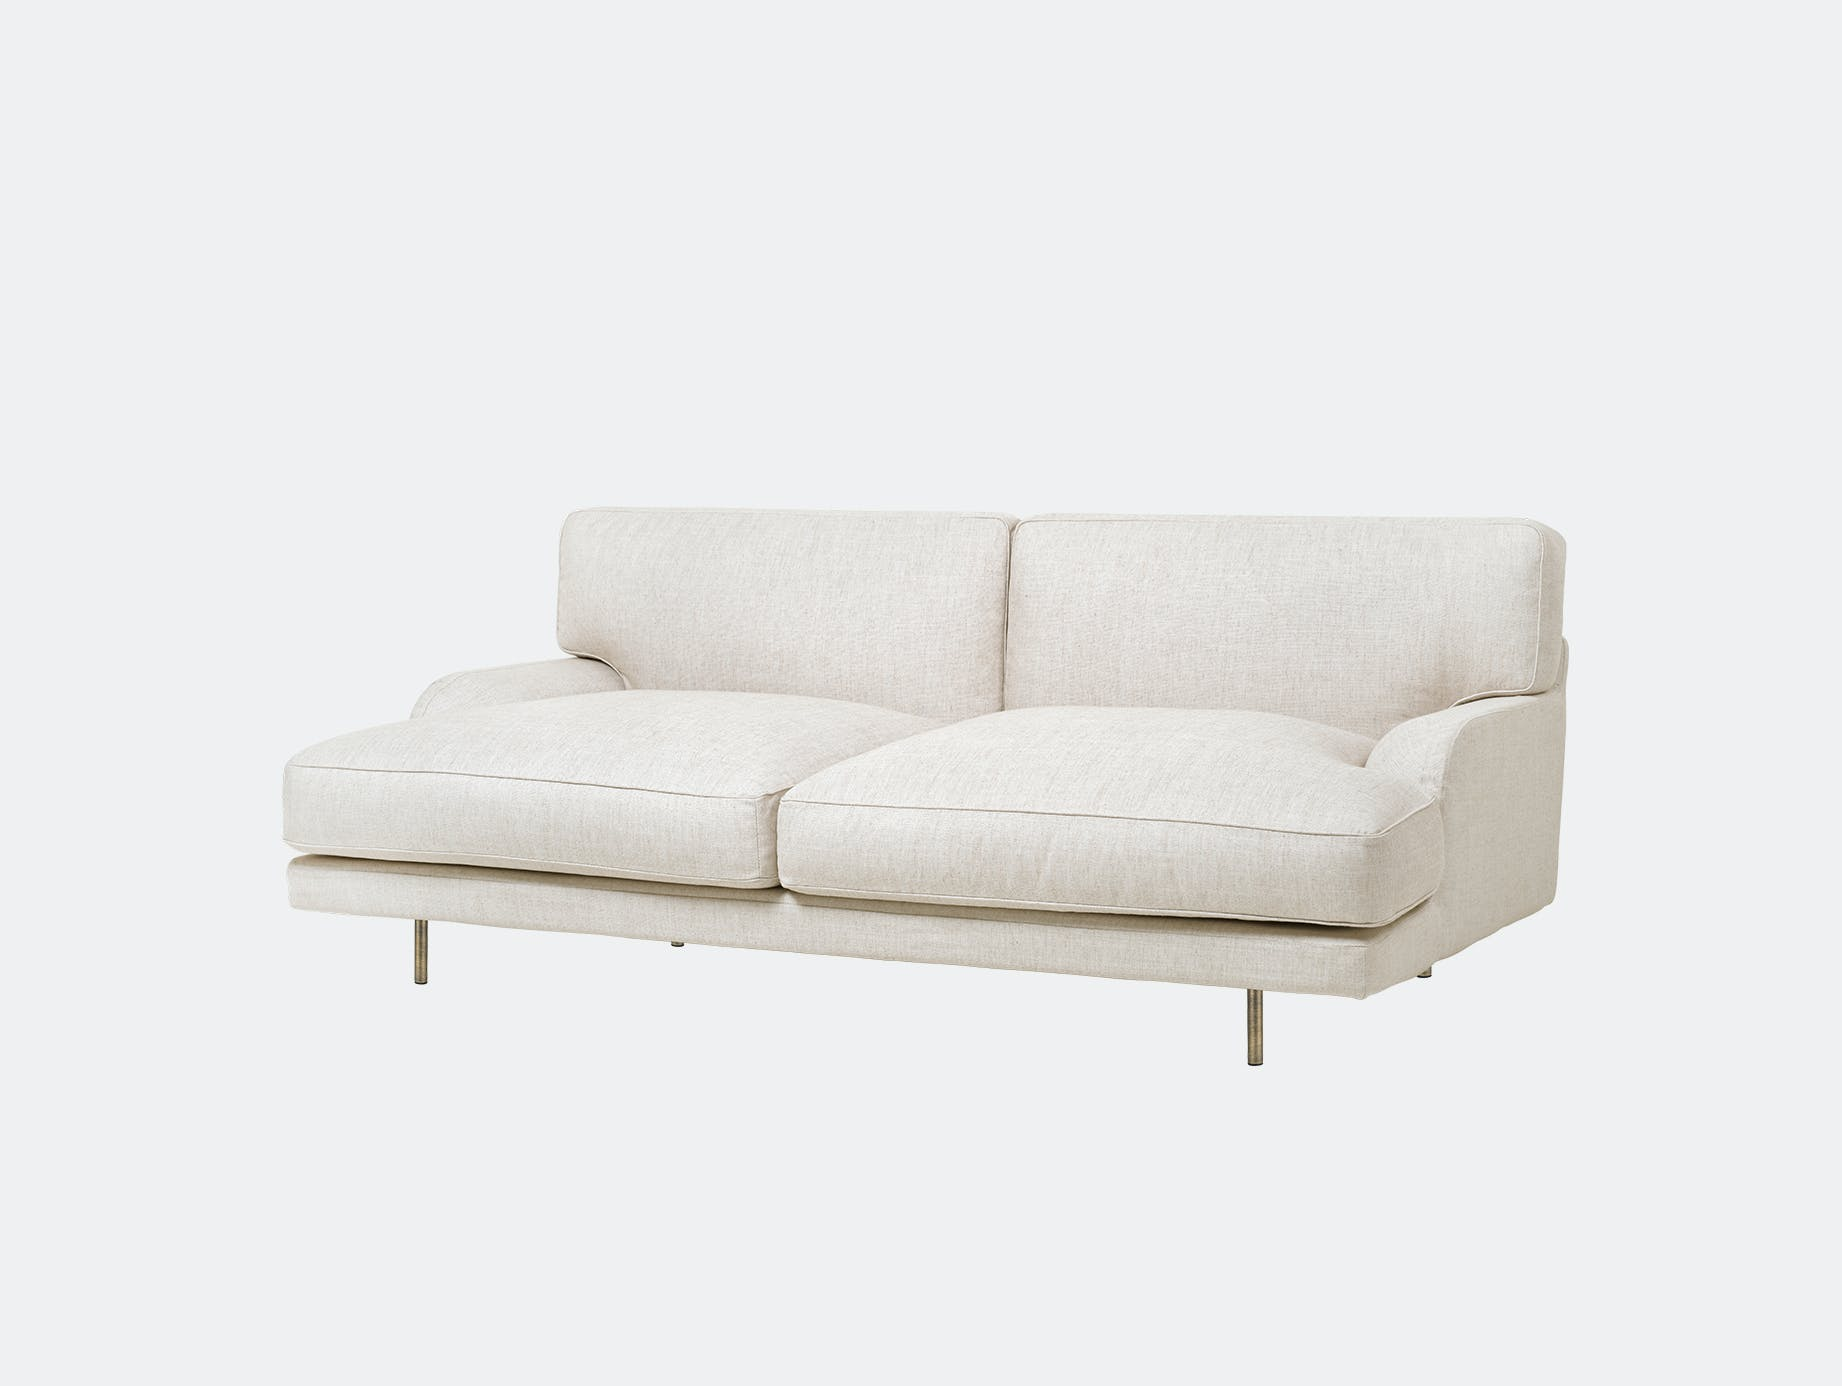 Gubi flaneur sofa 2 seat chambray24 brs d